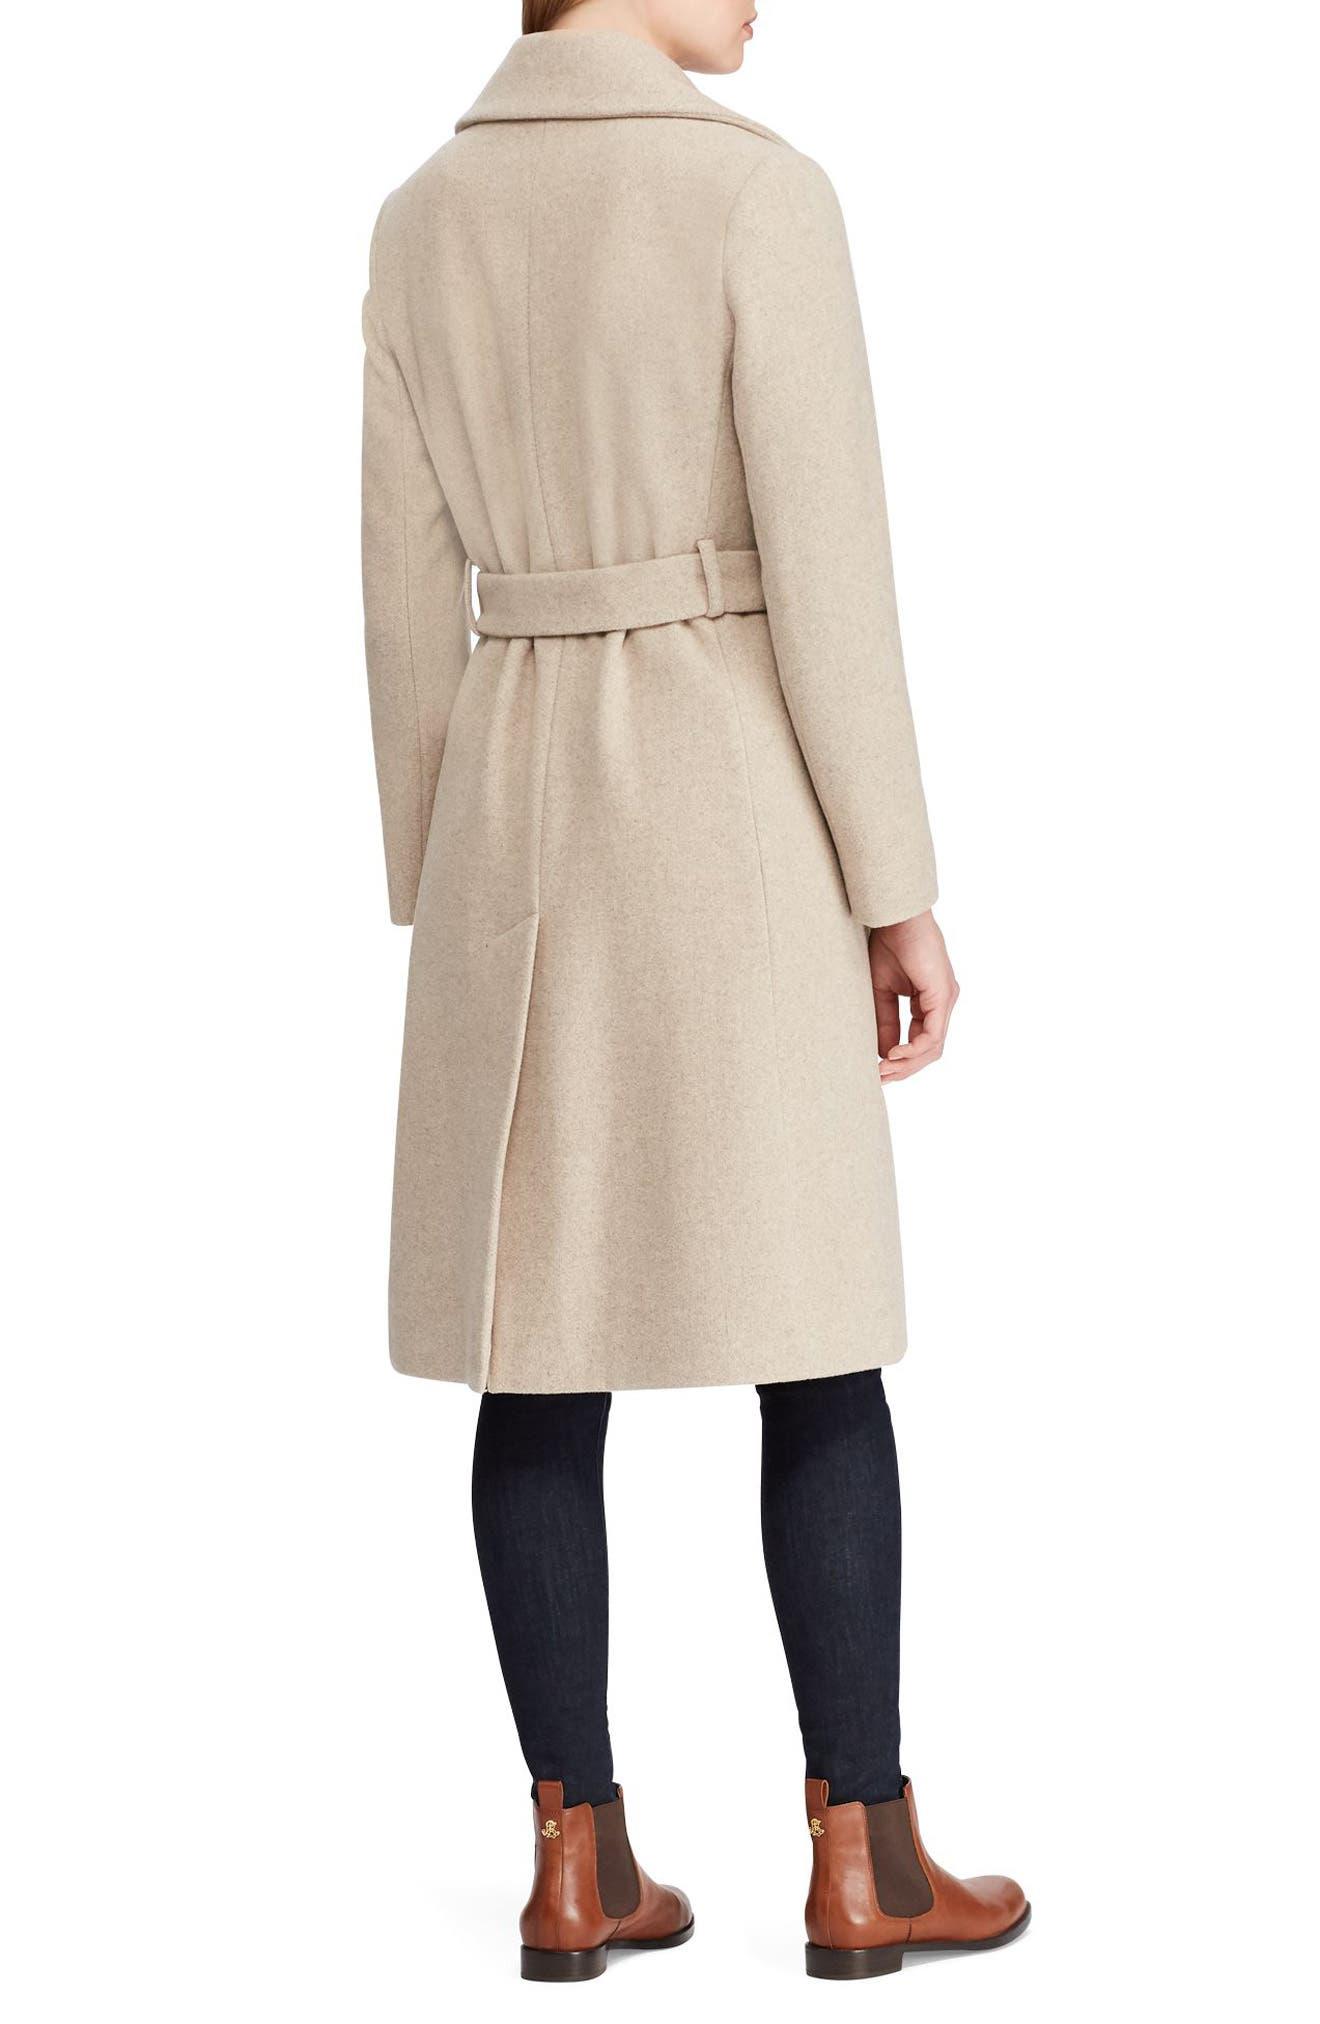 LAUREN RALPH LAUREN,                             Wool Blend Wrap Coat,                             Alternate thumbnail 2, color,                             063